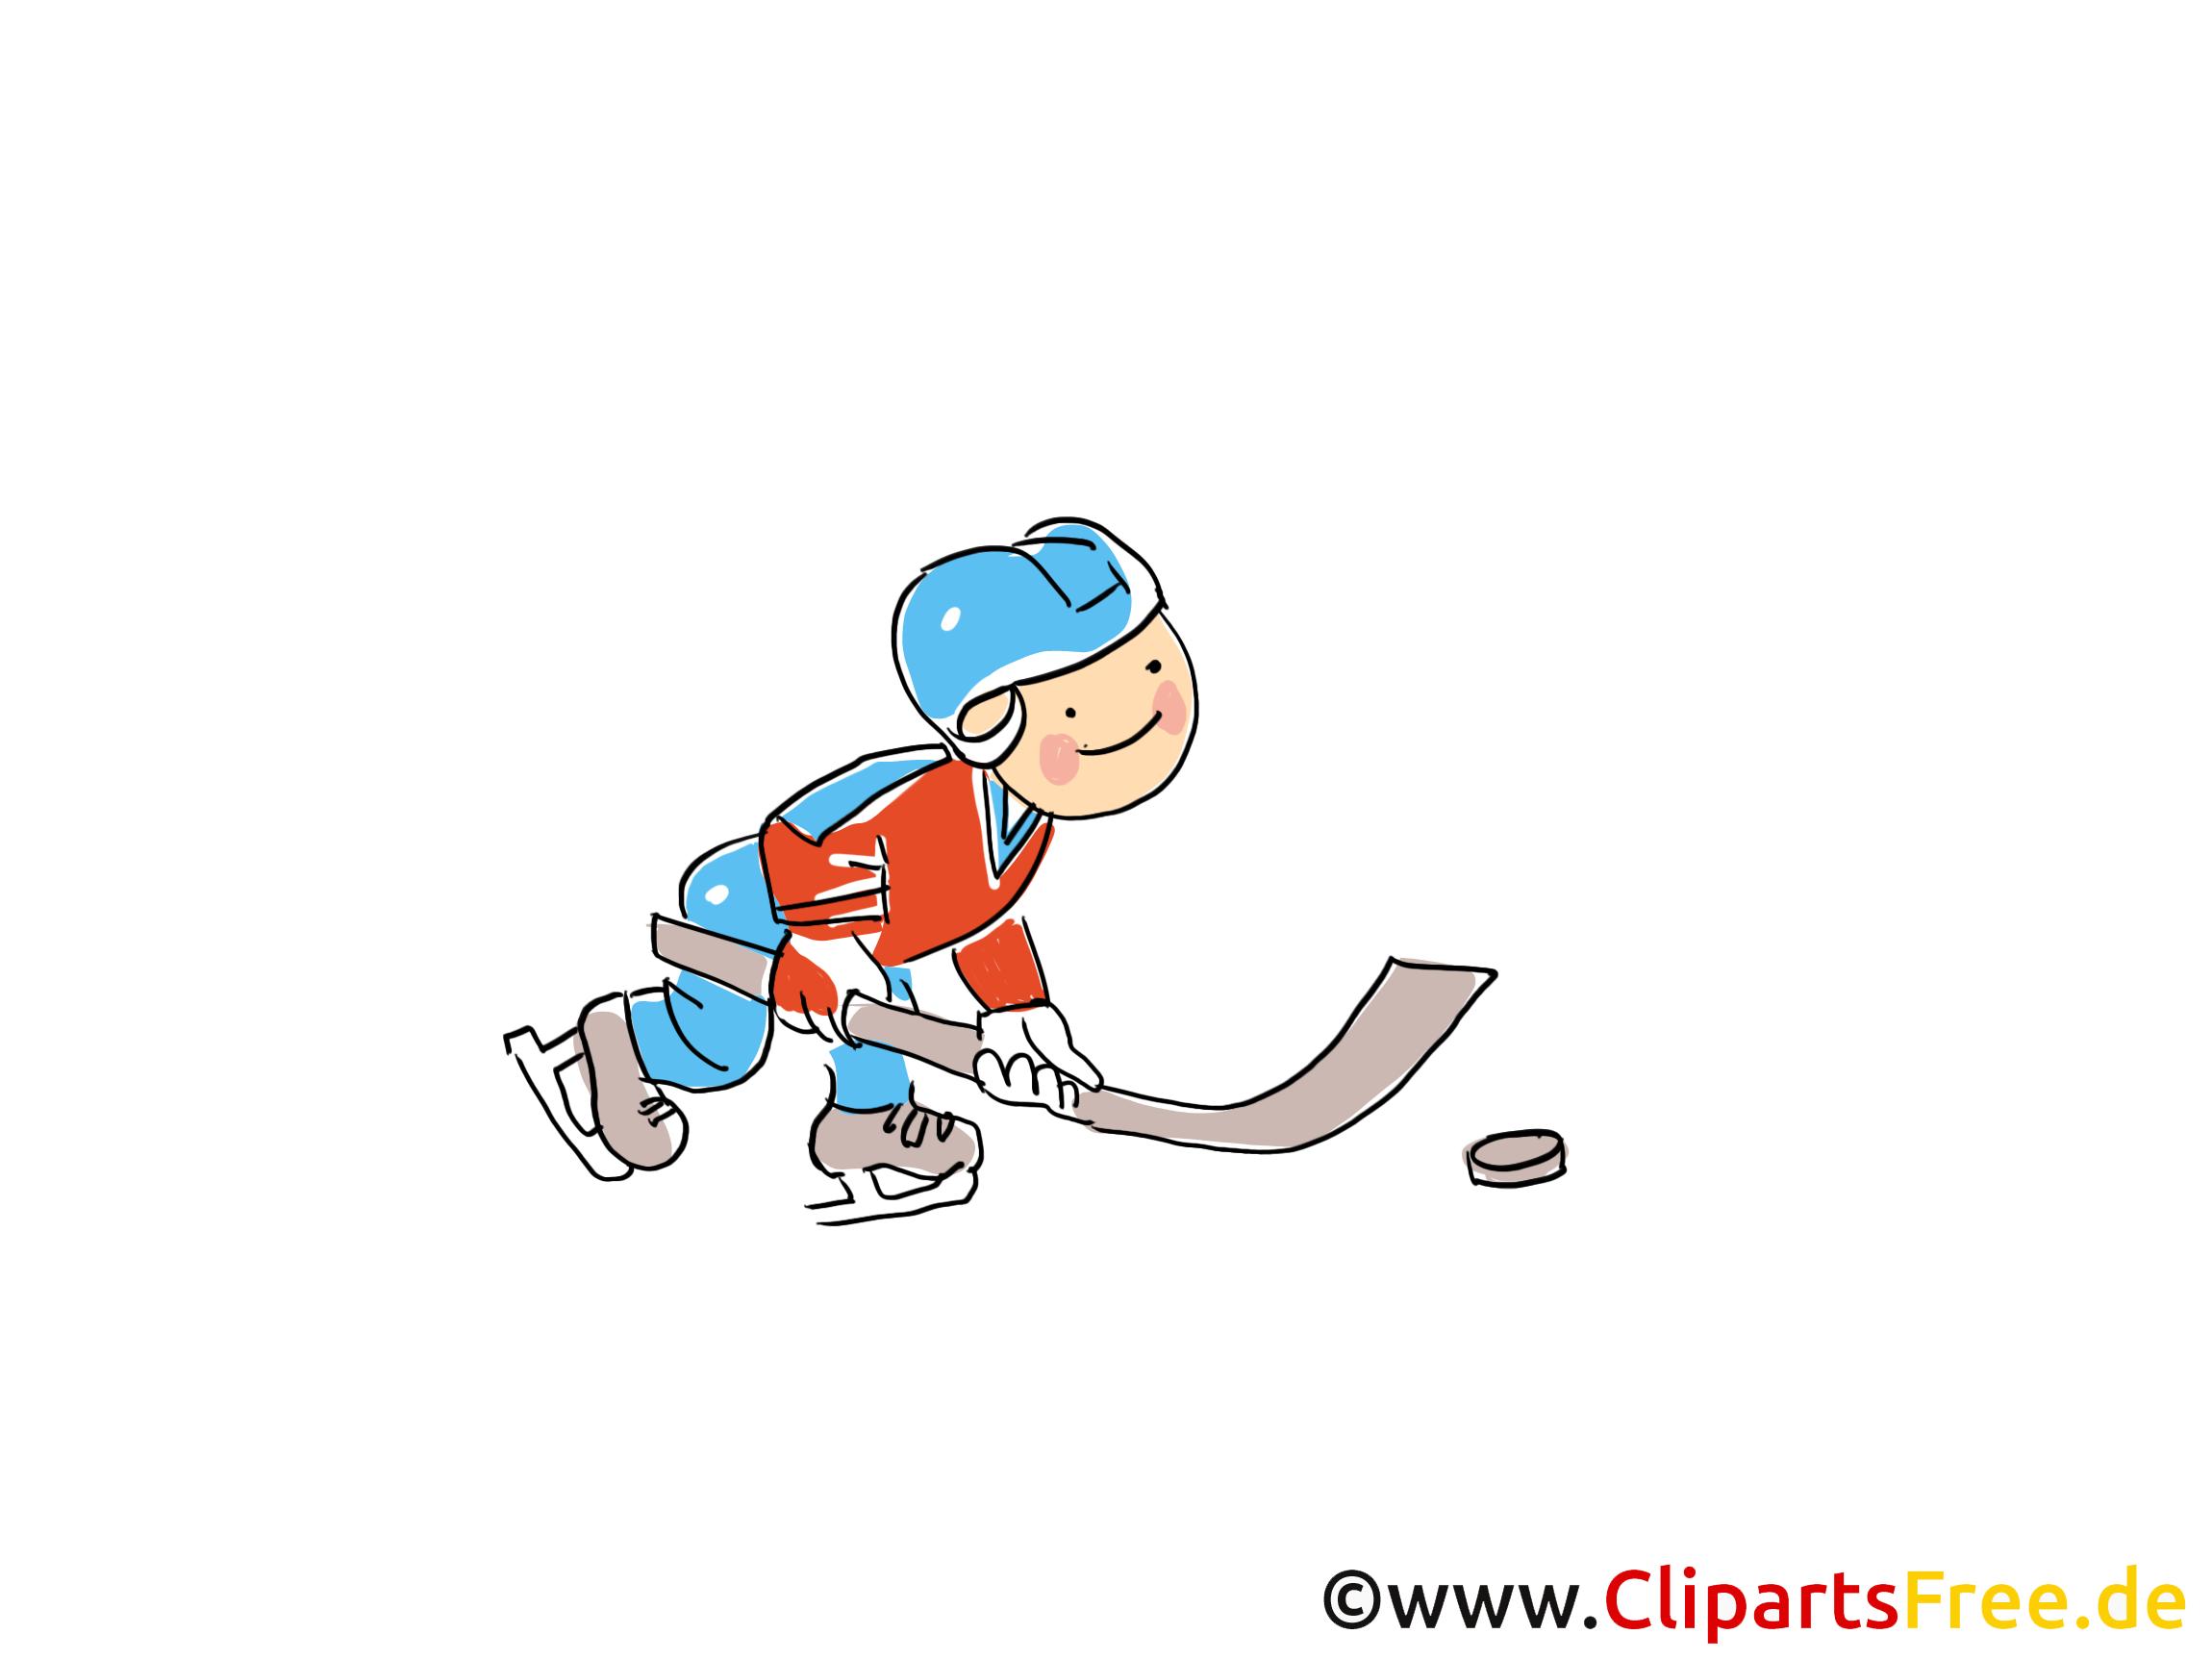 Petit hockeyeur dessins gratuits hockey clipart hockey sur glace dessin picture image - Dessin hockey sur glace ...